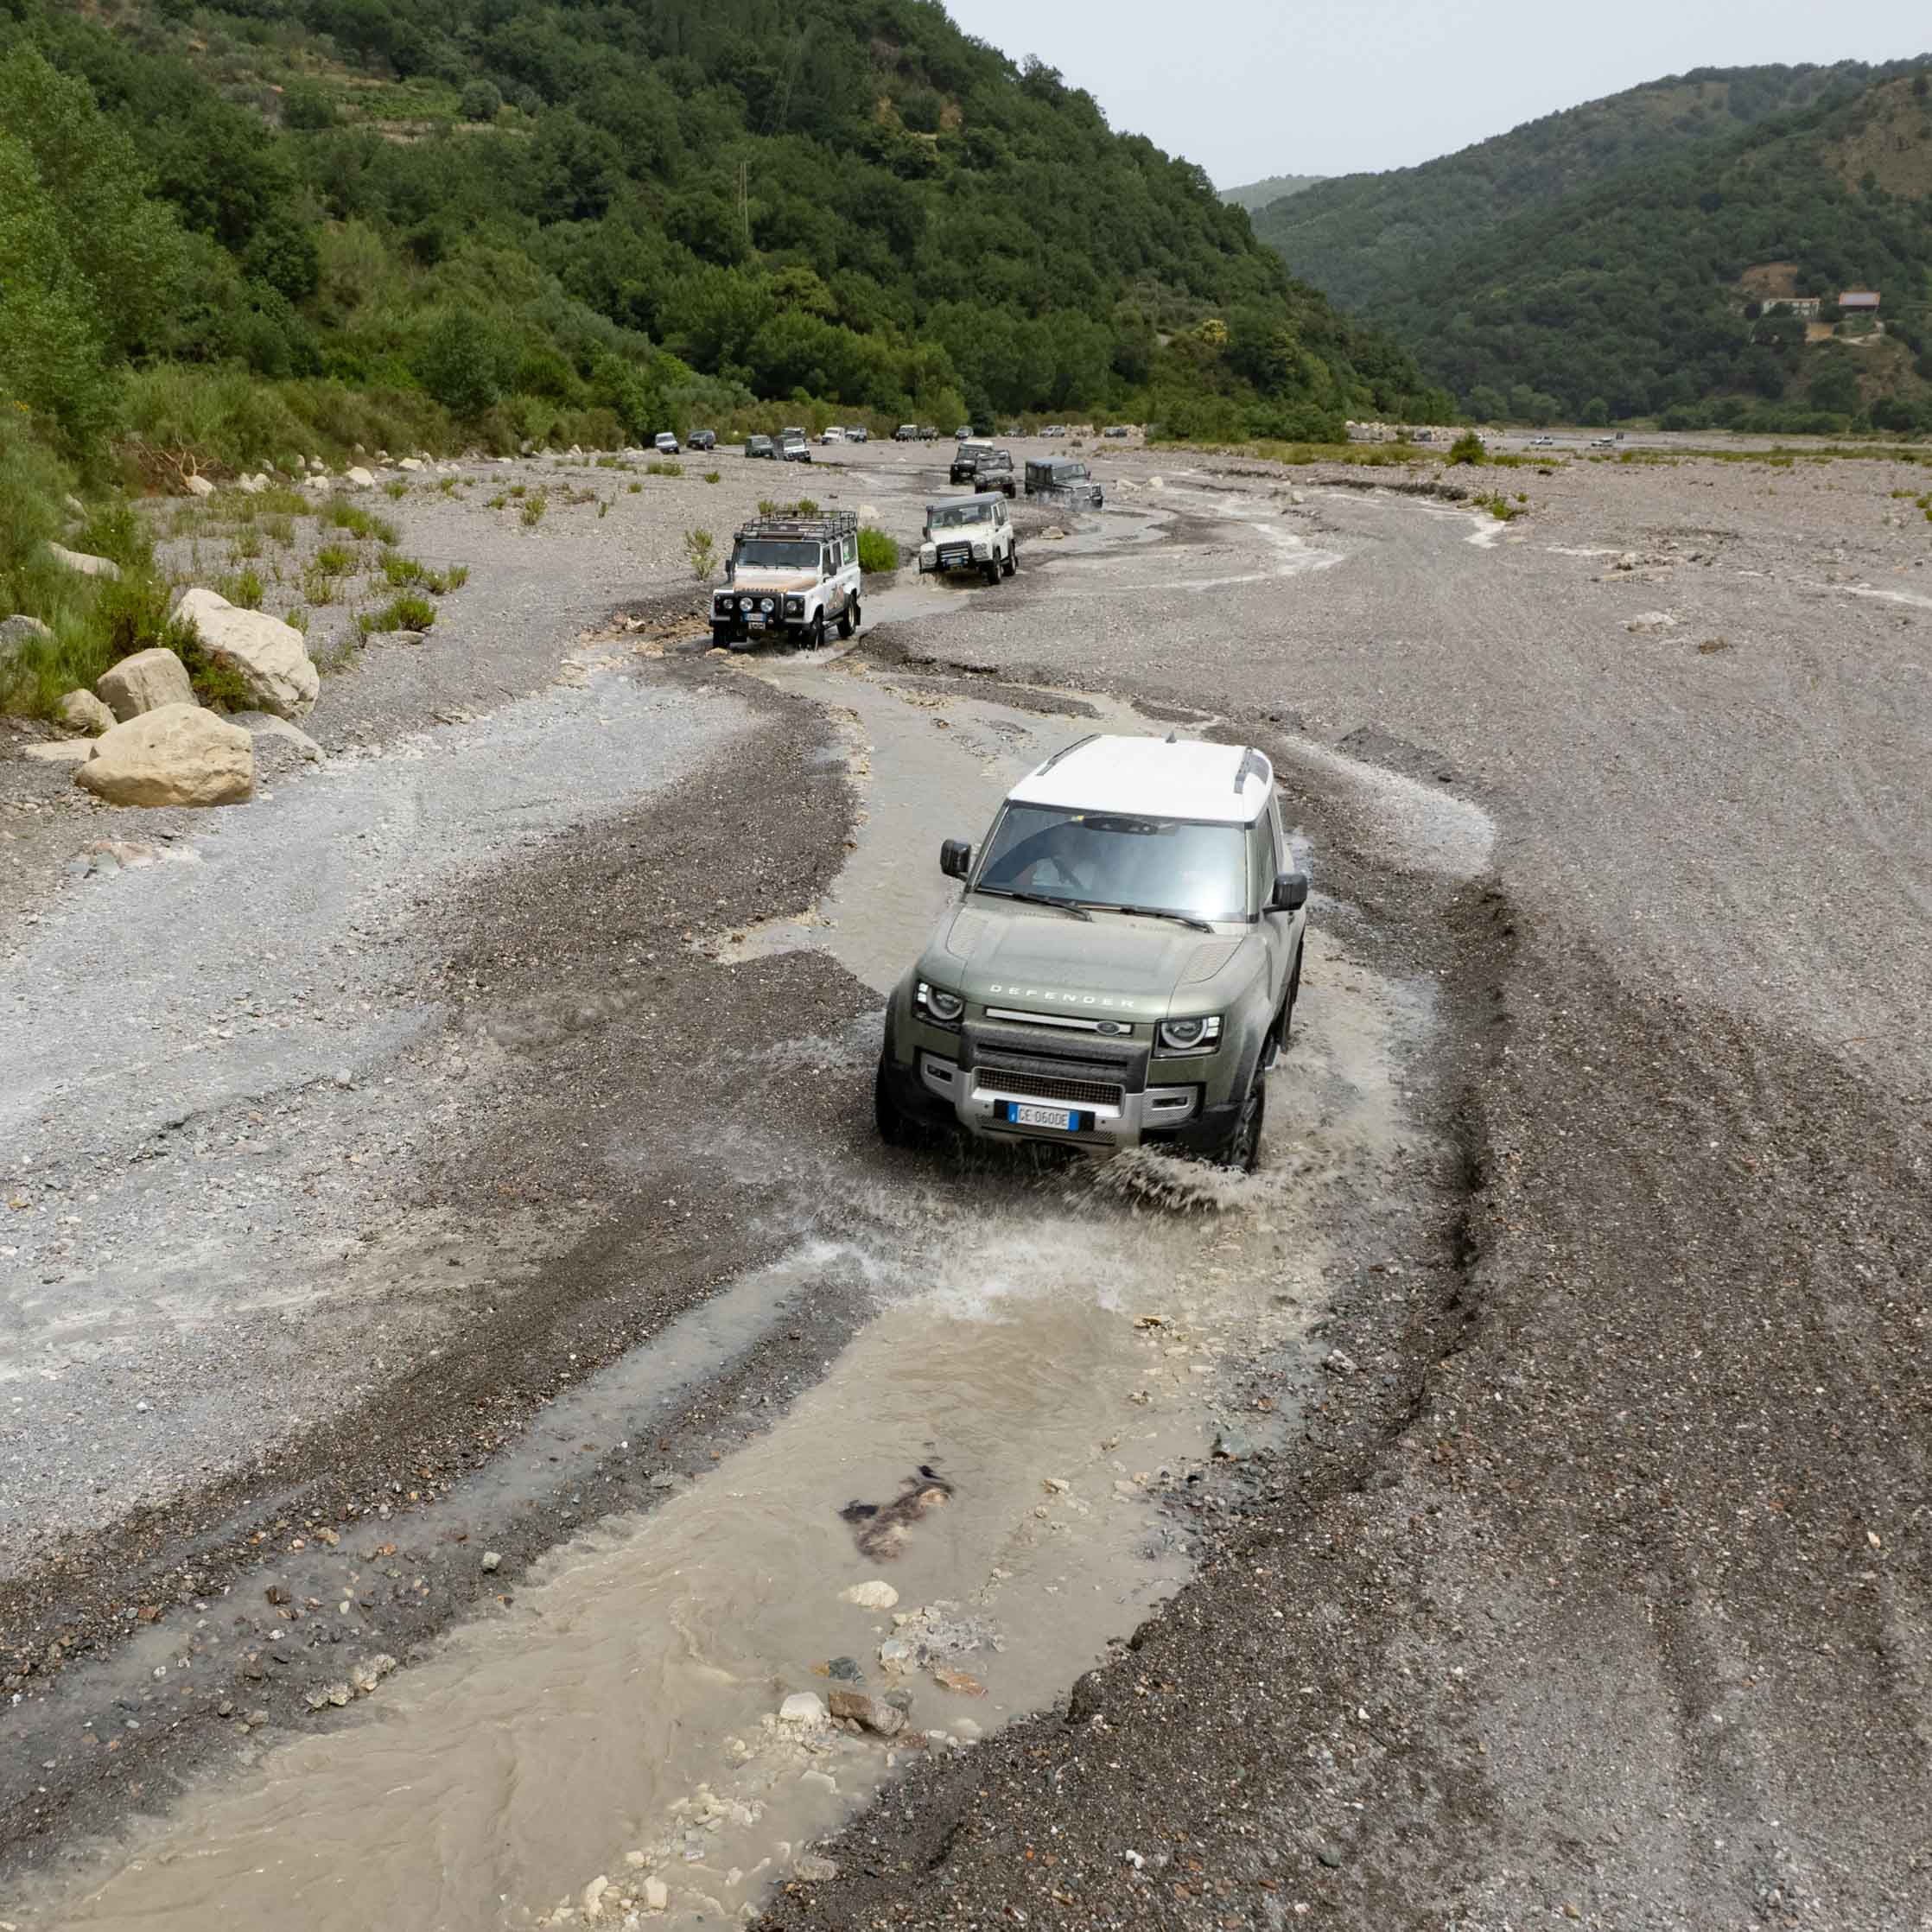 Land_Rover_Tour_Sicilia_2021_Land_Rover_Experience_Italia_-24